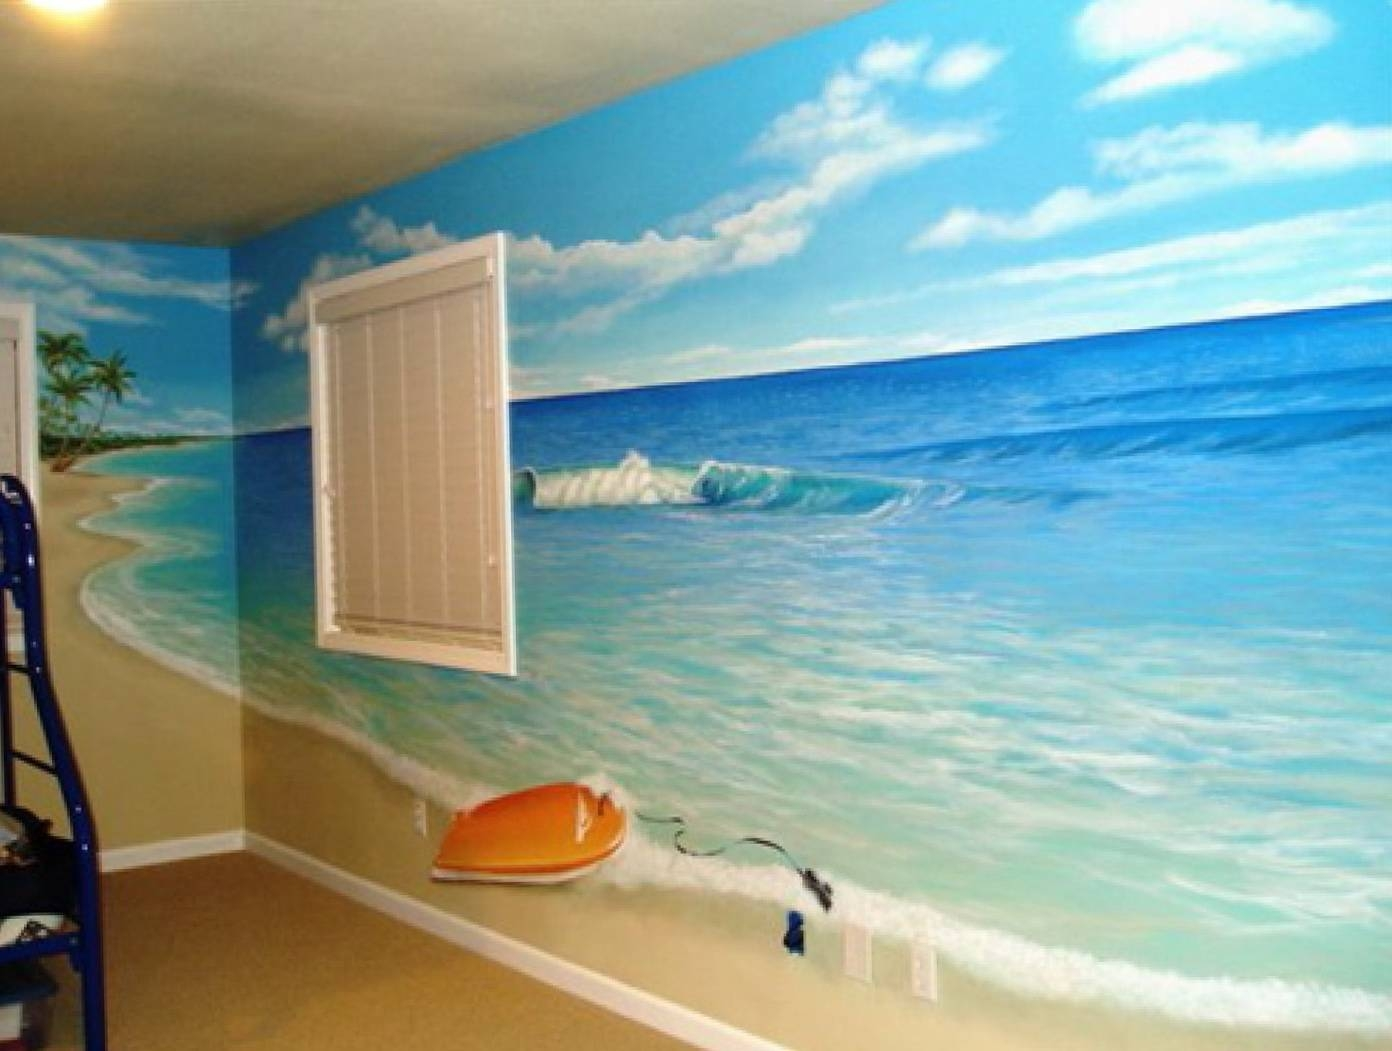 Beach Wall Art Ideas | Home Design Ideas With 2018 Beach 3D Wall Art (View 20 of 20)